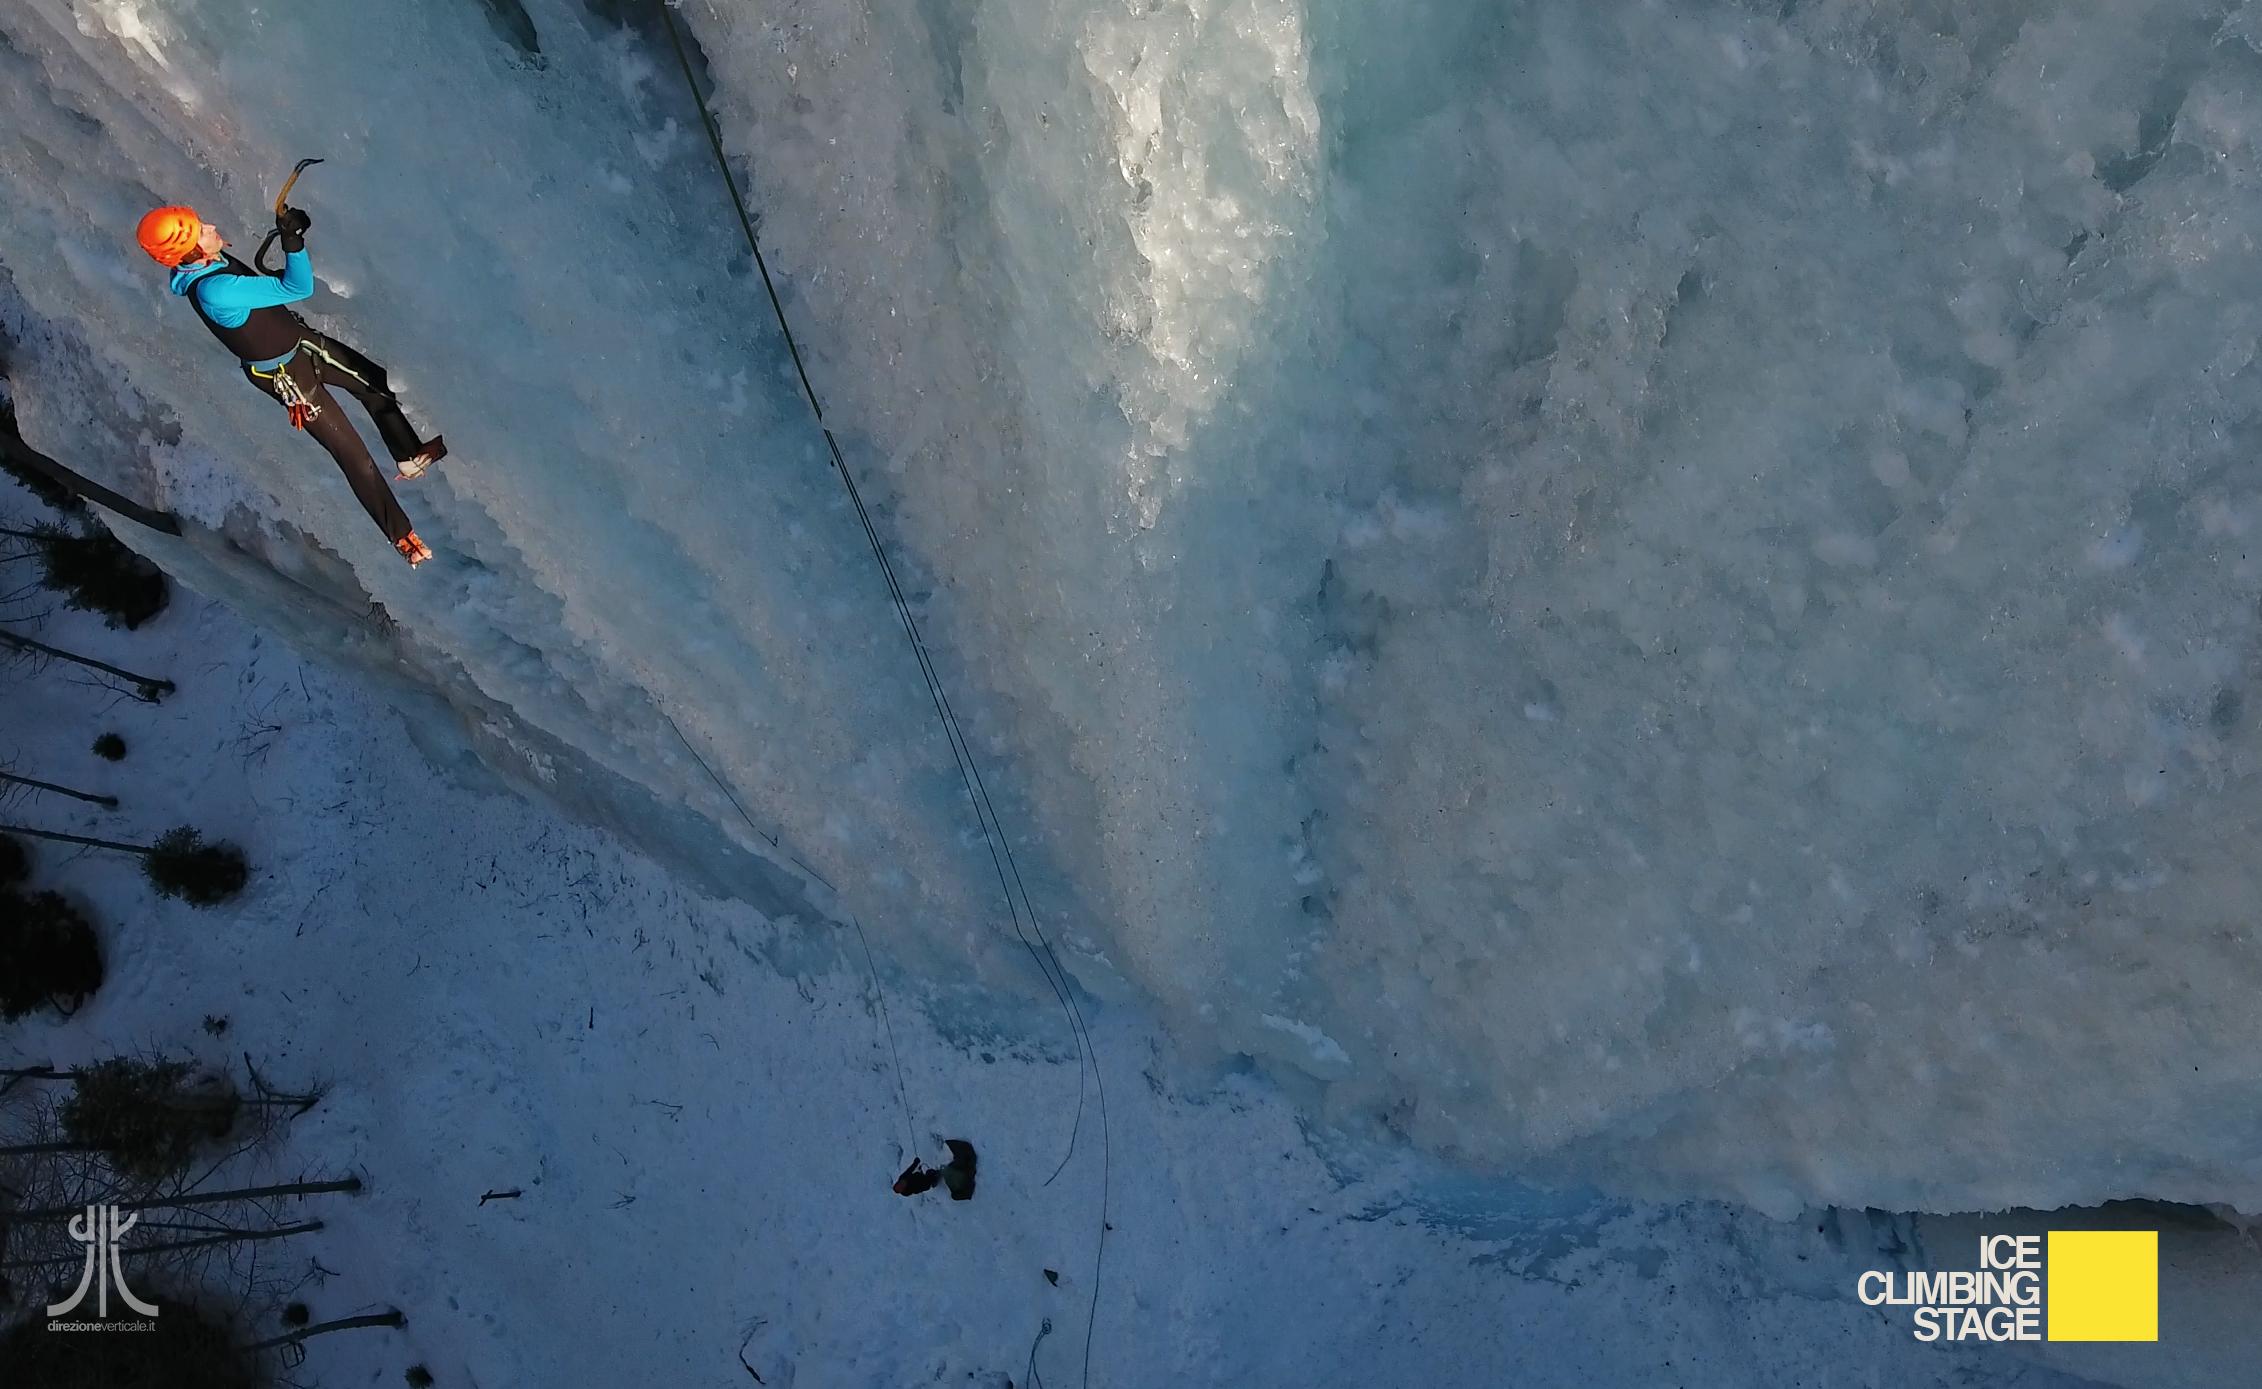 iceclimbingstage